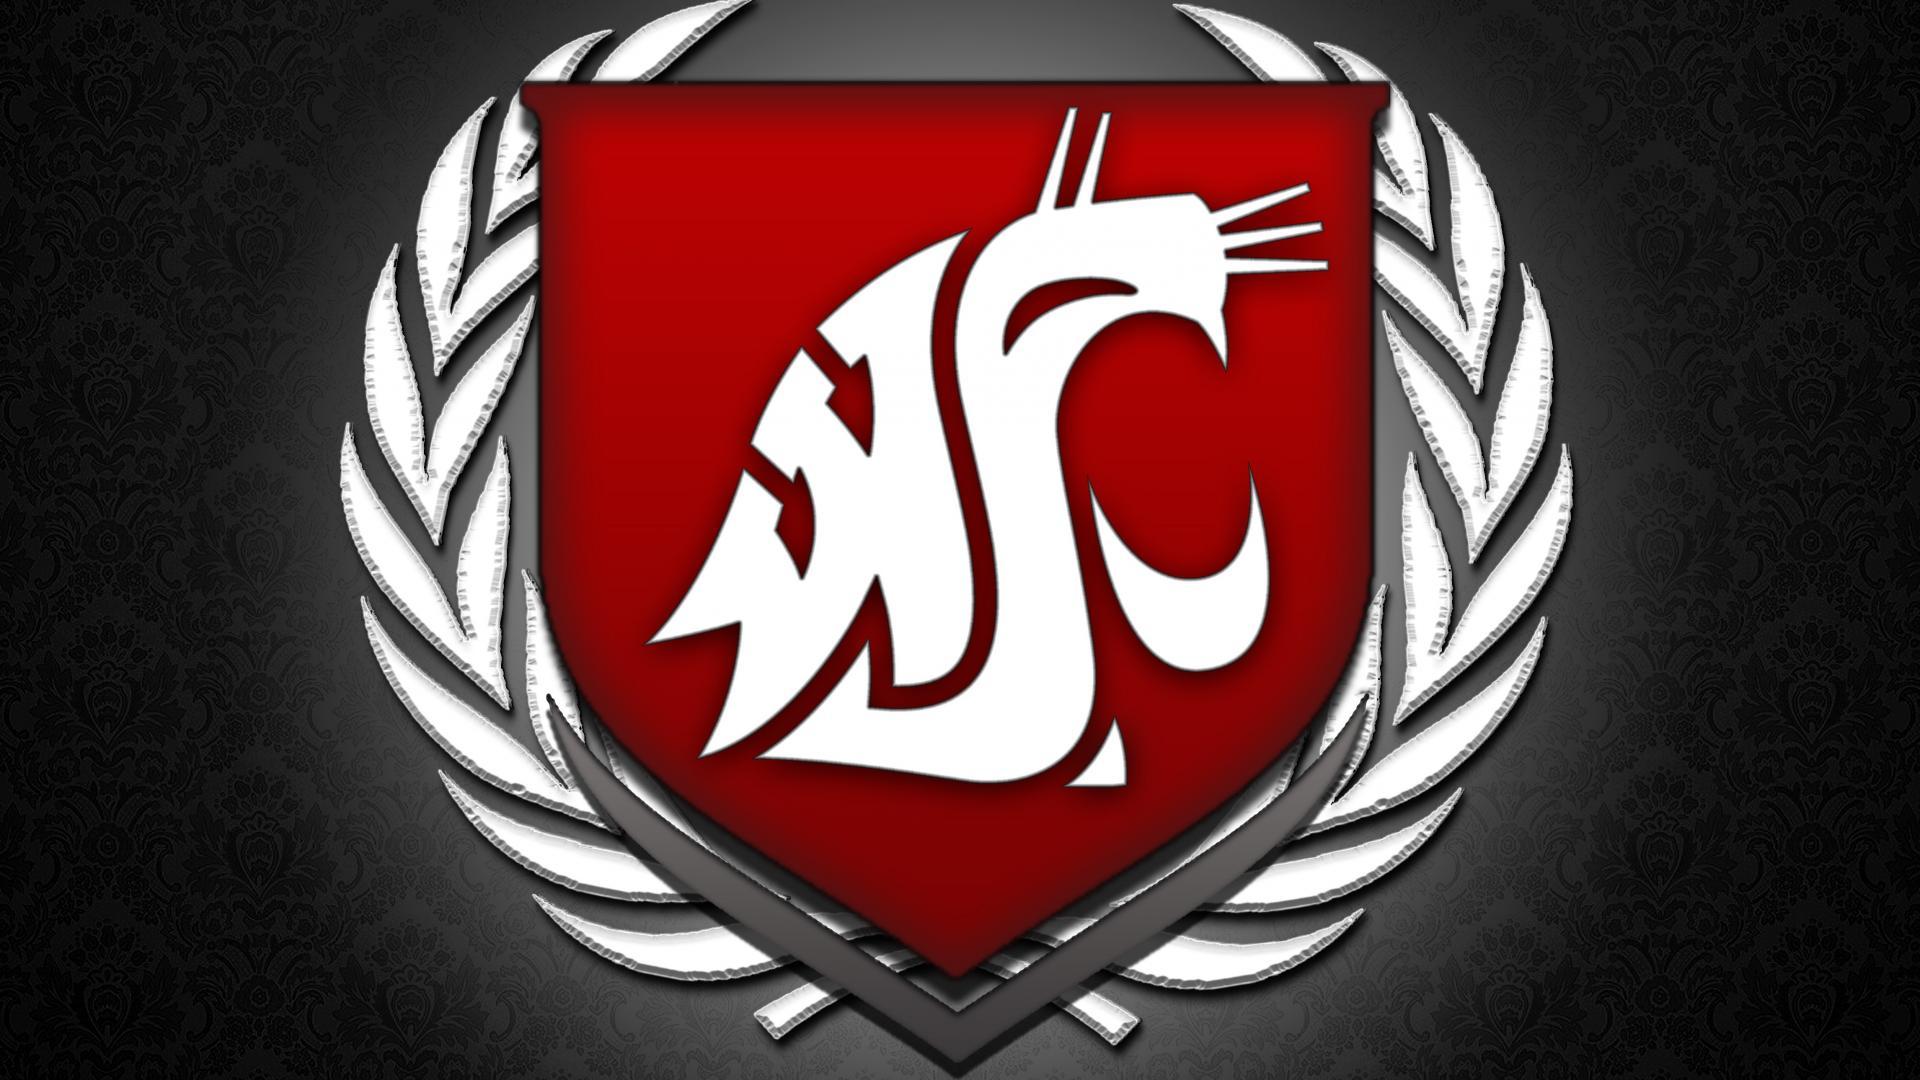 Wsu washington state university cougars wallpaper 110846 1920x1080